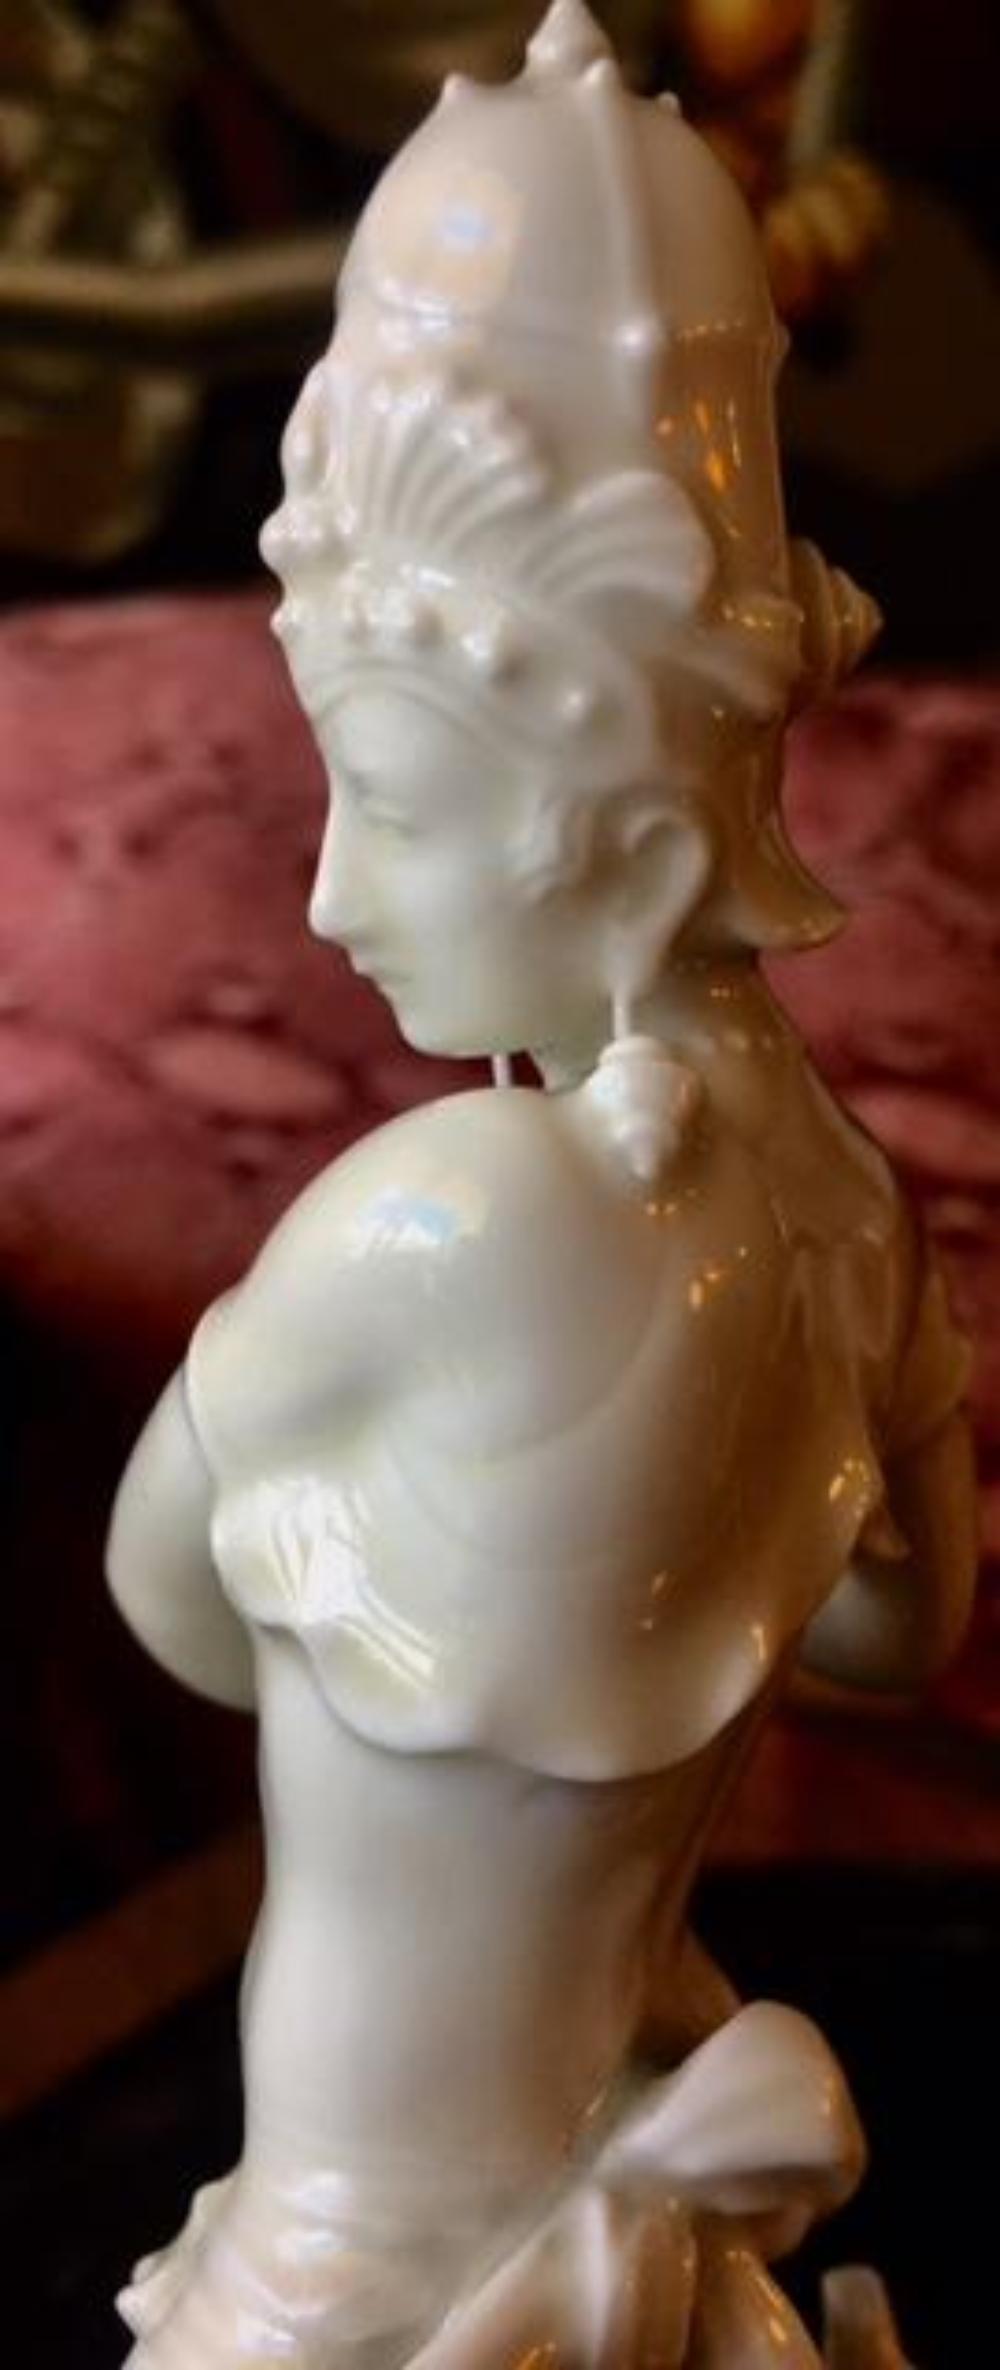 Lot 137: Rare Forster Rosenthal Javanese Dancer Figurine